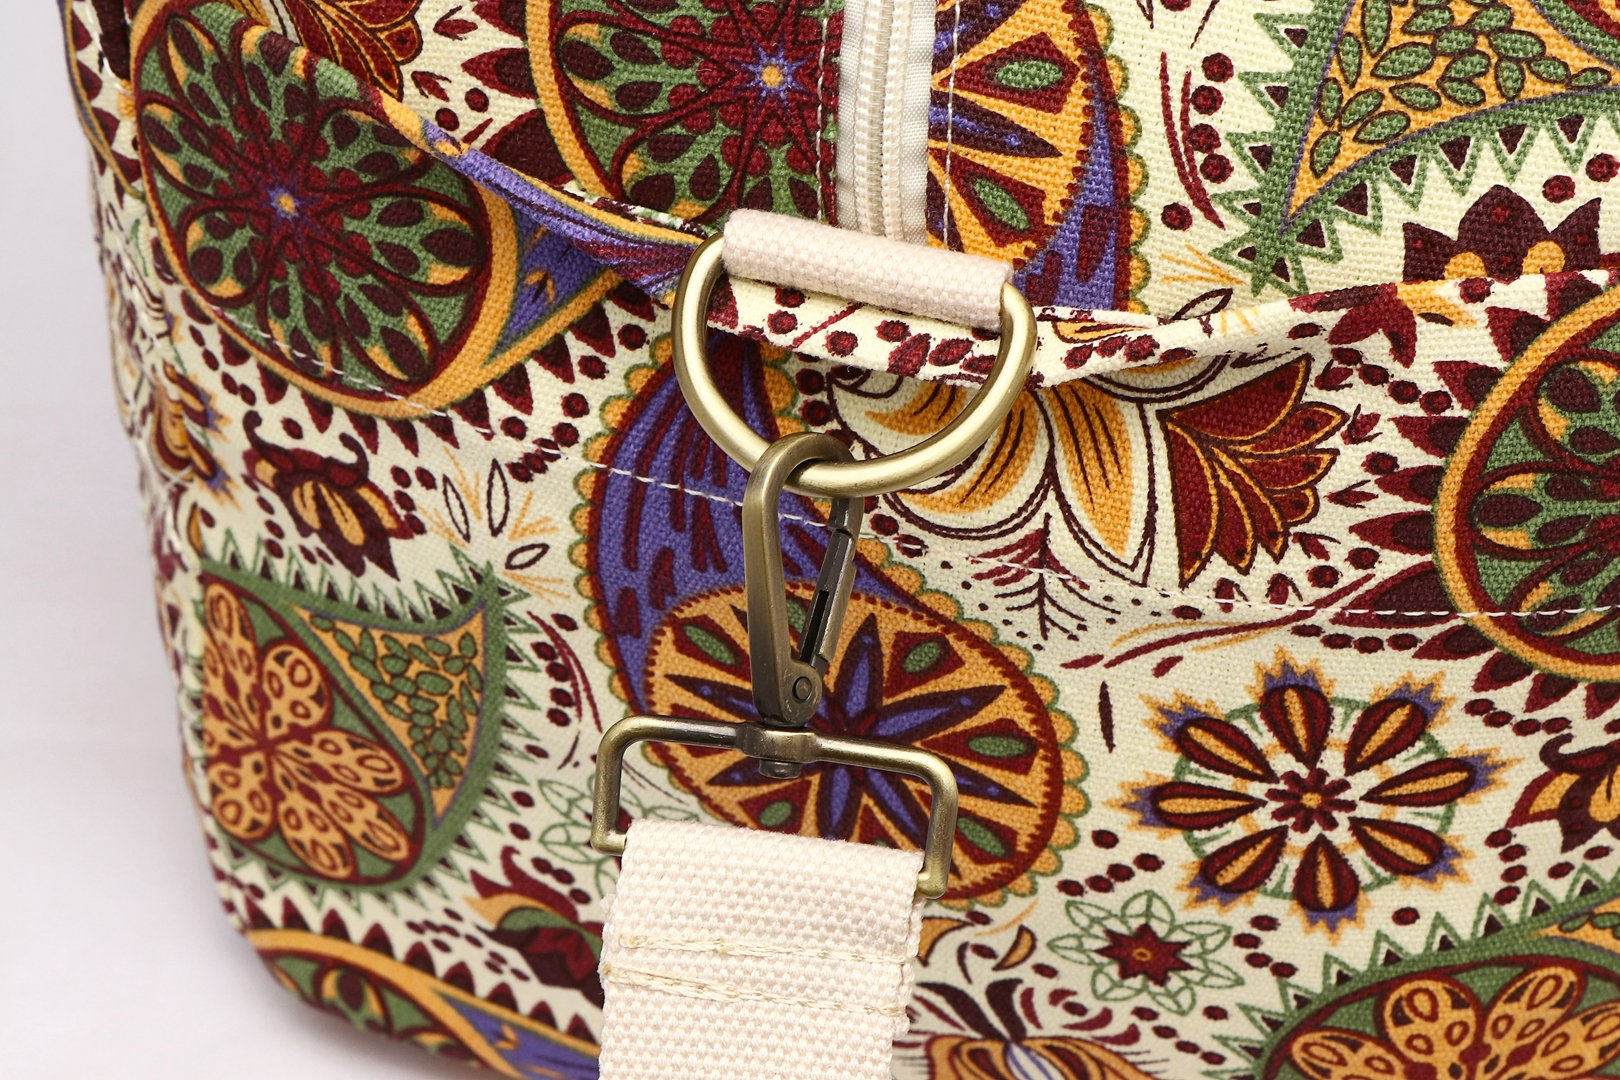 Malirona Canvas Weekender Bag Travel Duffel Bag for Weekend Overnight Trip (Yellow Flower) by Malirona (Image #9)